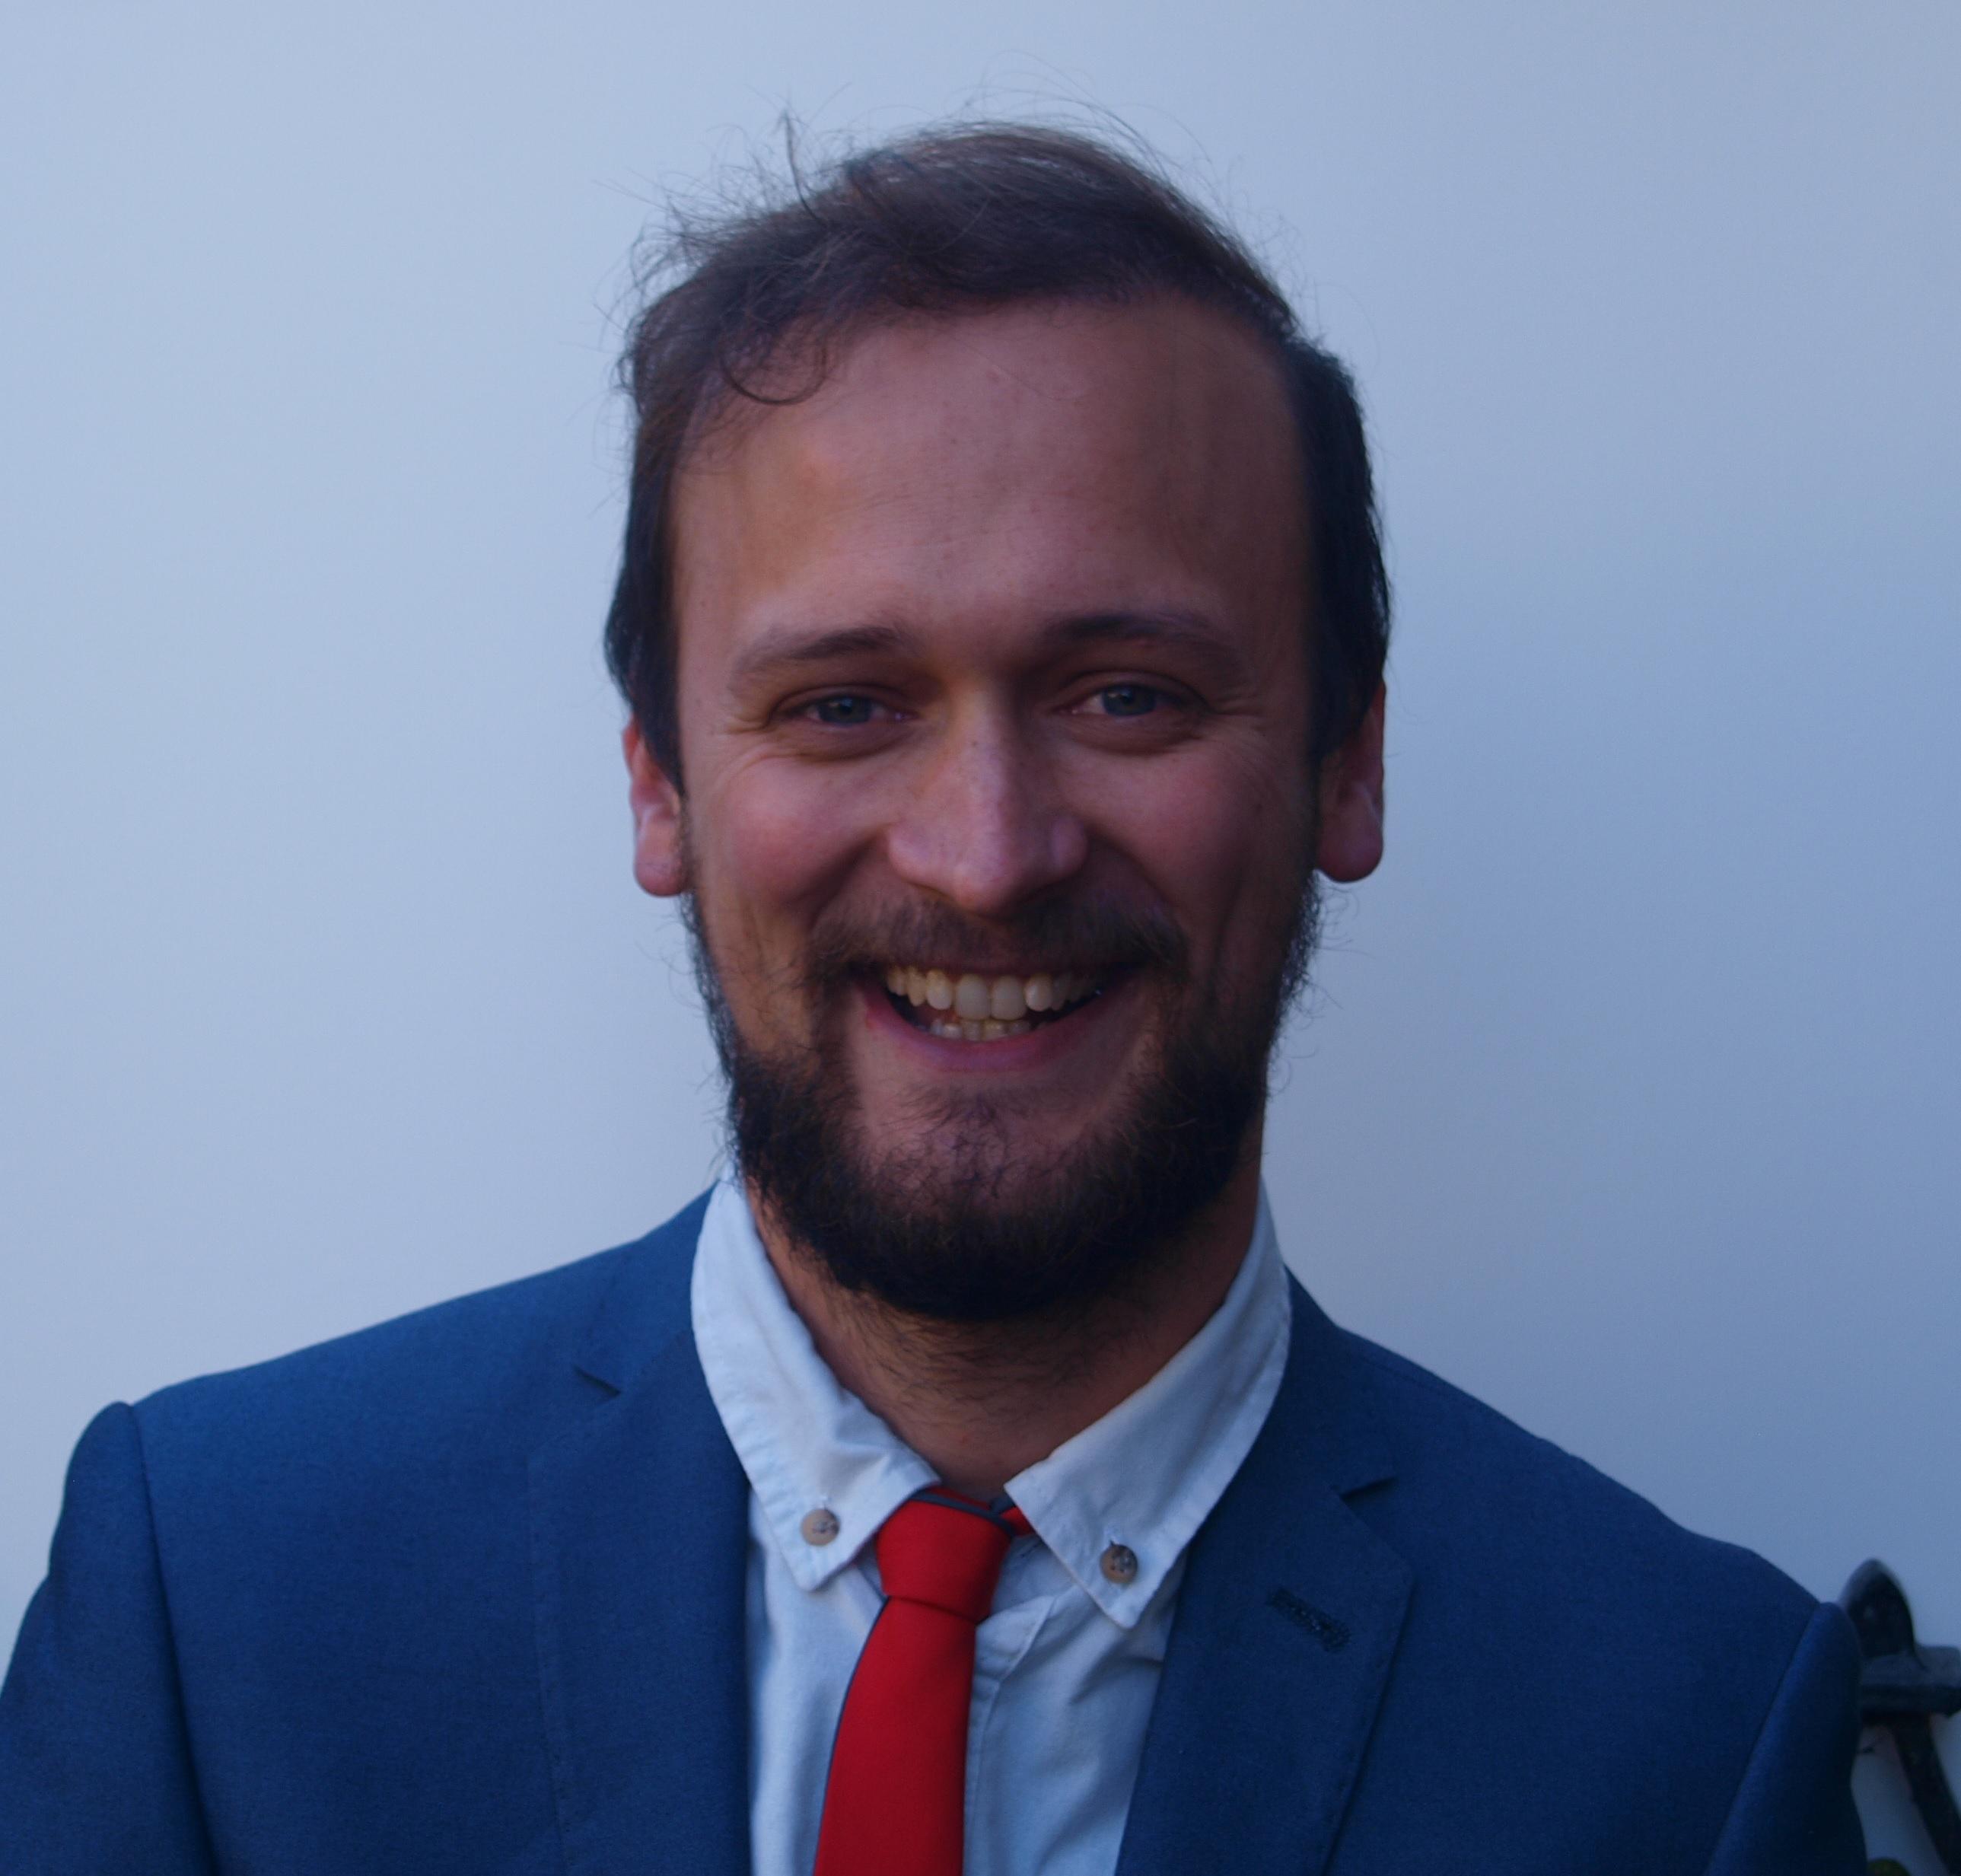 Luke_cresswell_-_Labour-Sudbury_South_Councillor.jpg